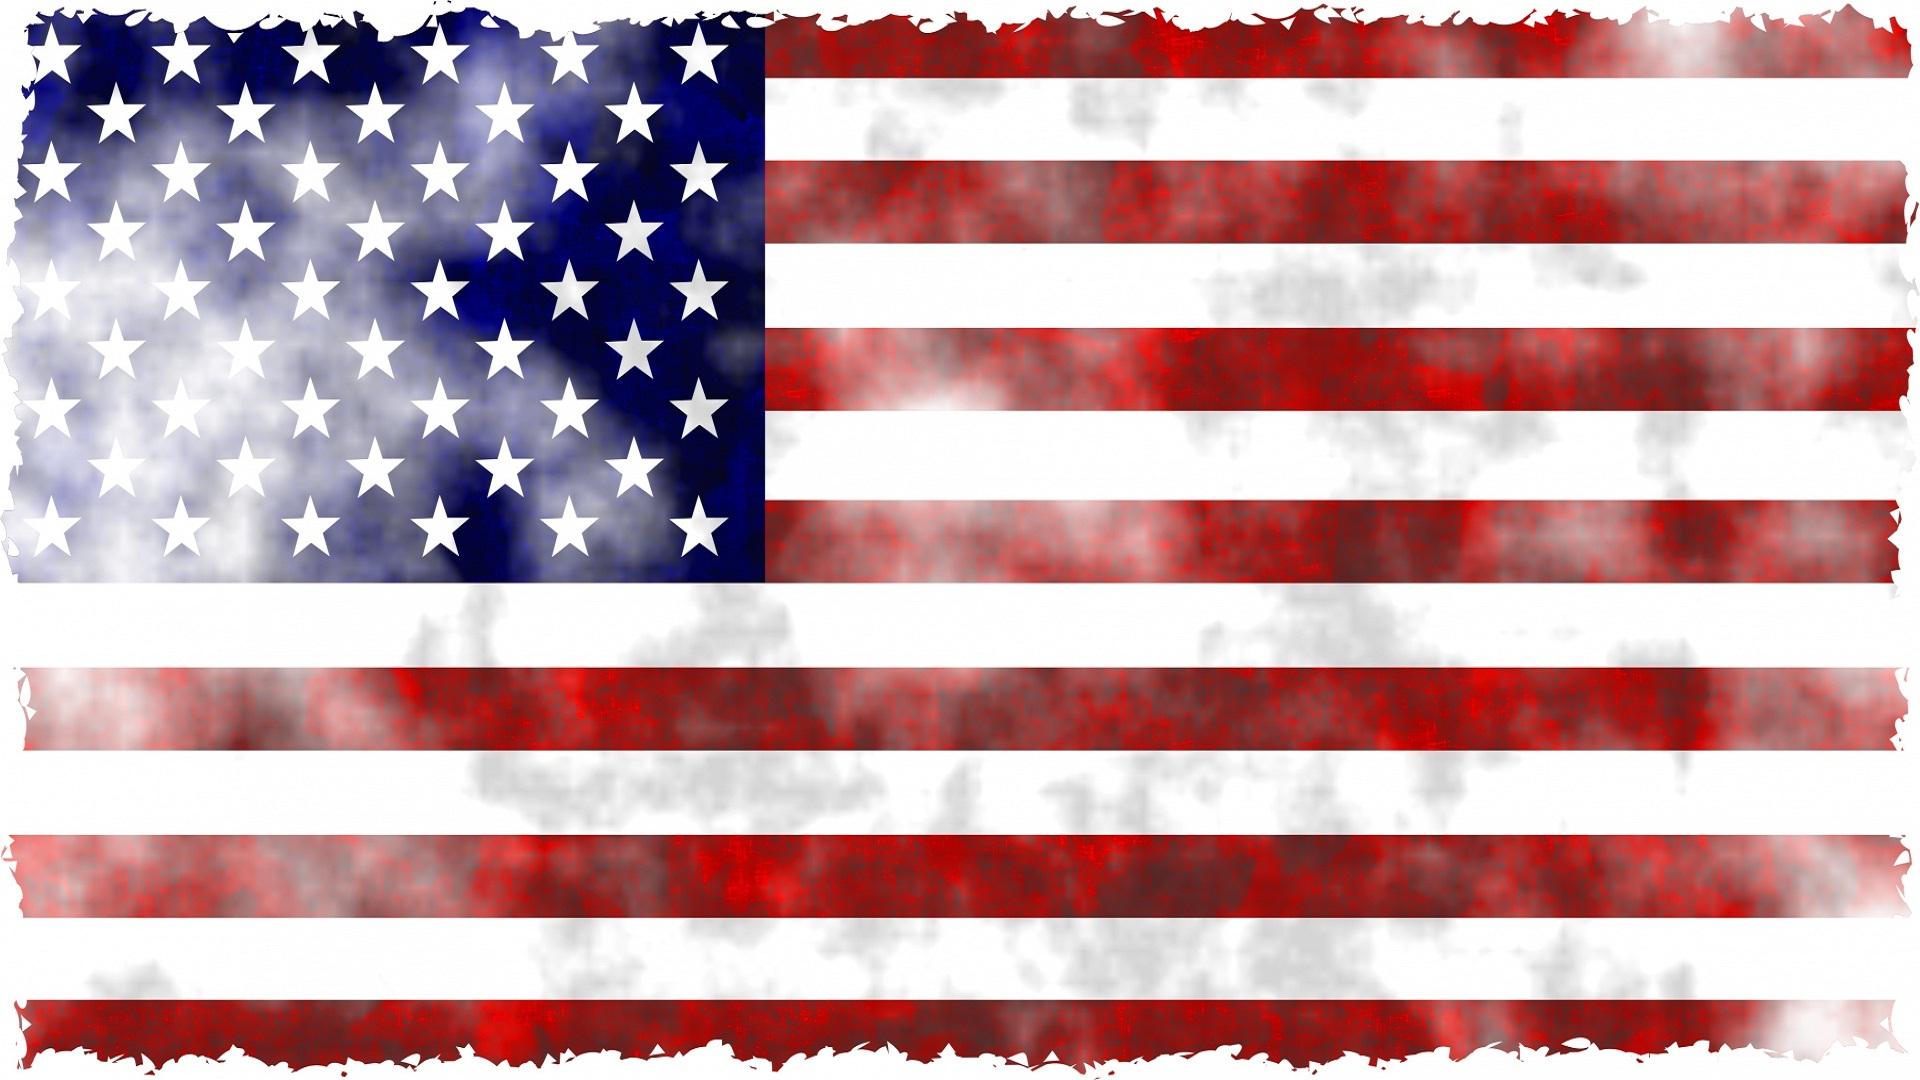 American Girl Wallpaper Hd American Flag Wallpapers Hd Pixelstalk Net